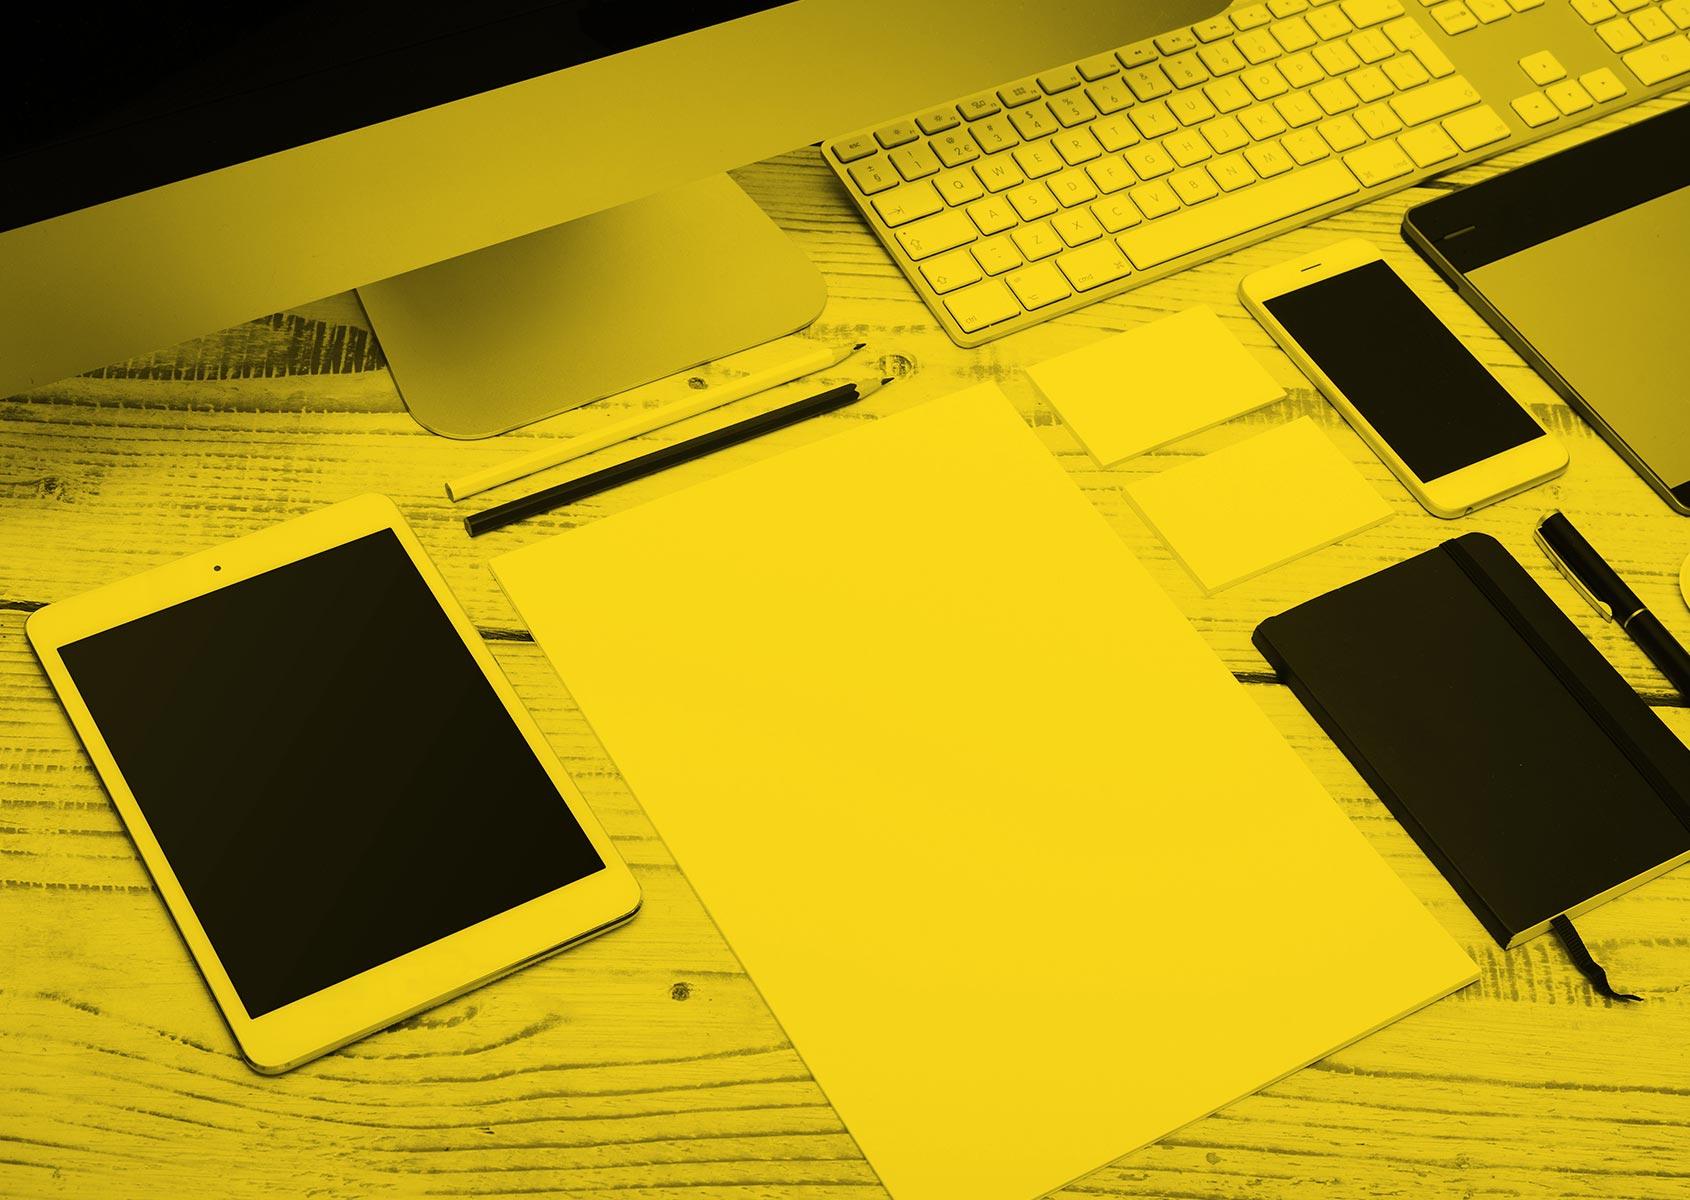 web-design-growth-driven-design-02.jpg